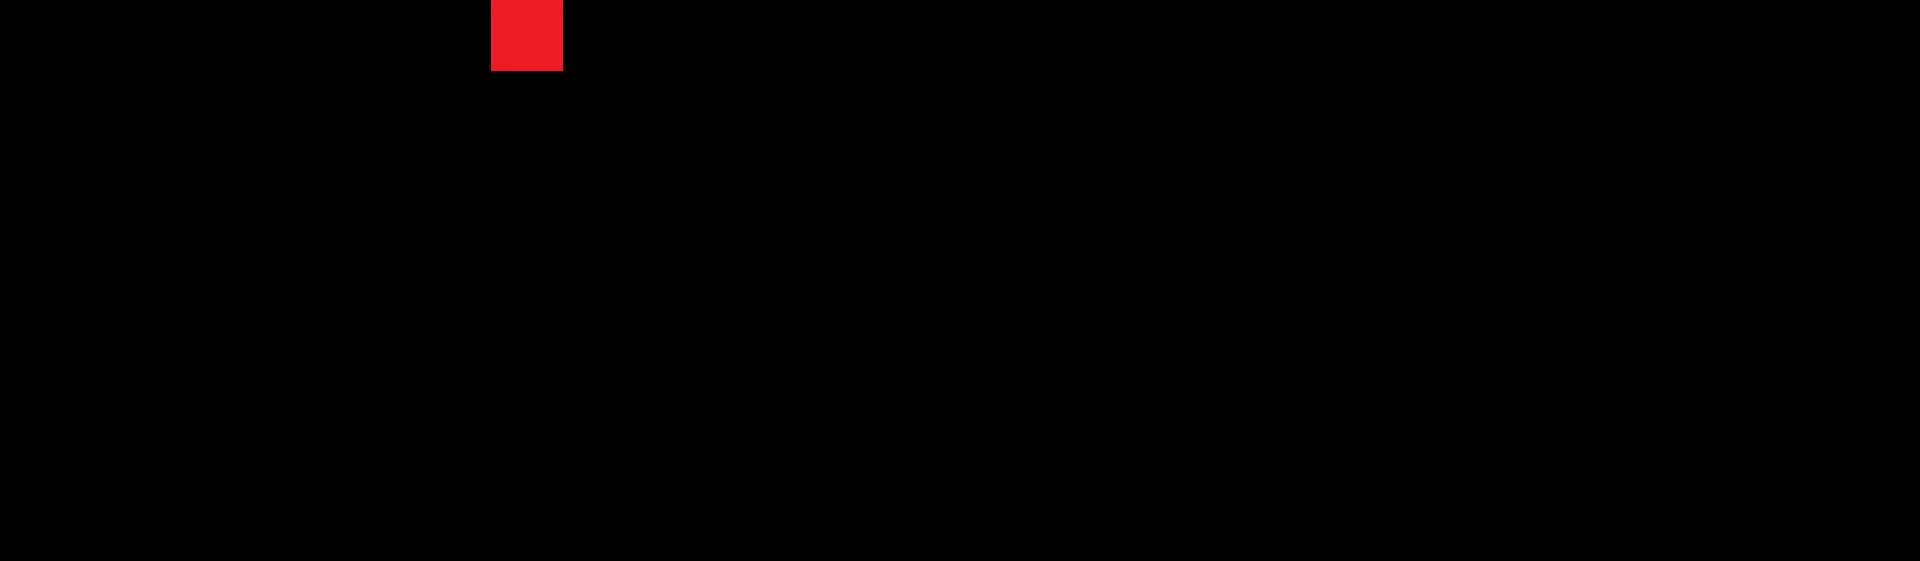 Raimtech